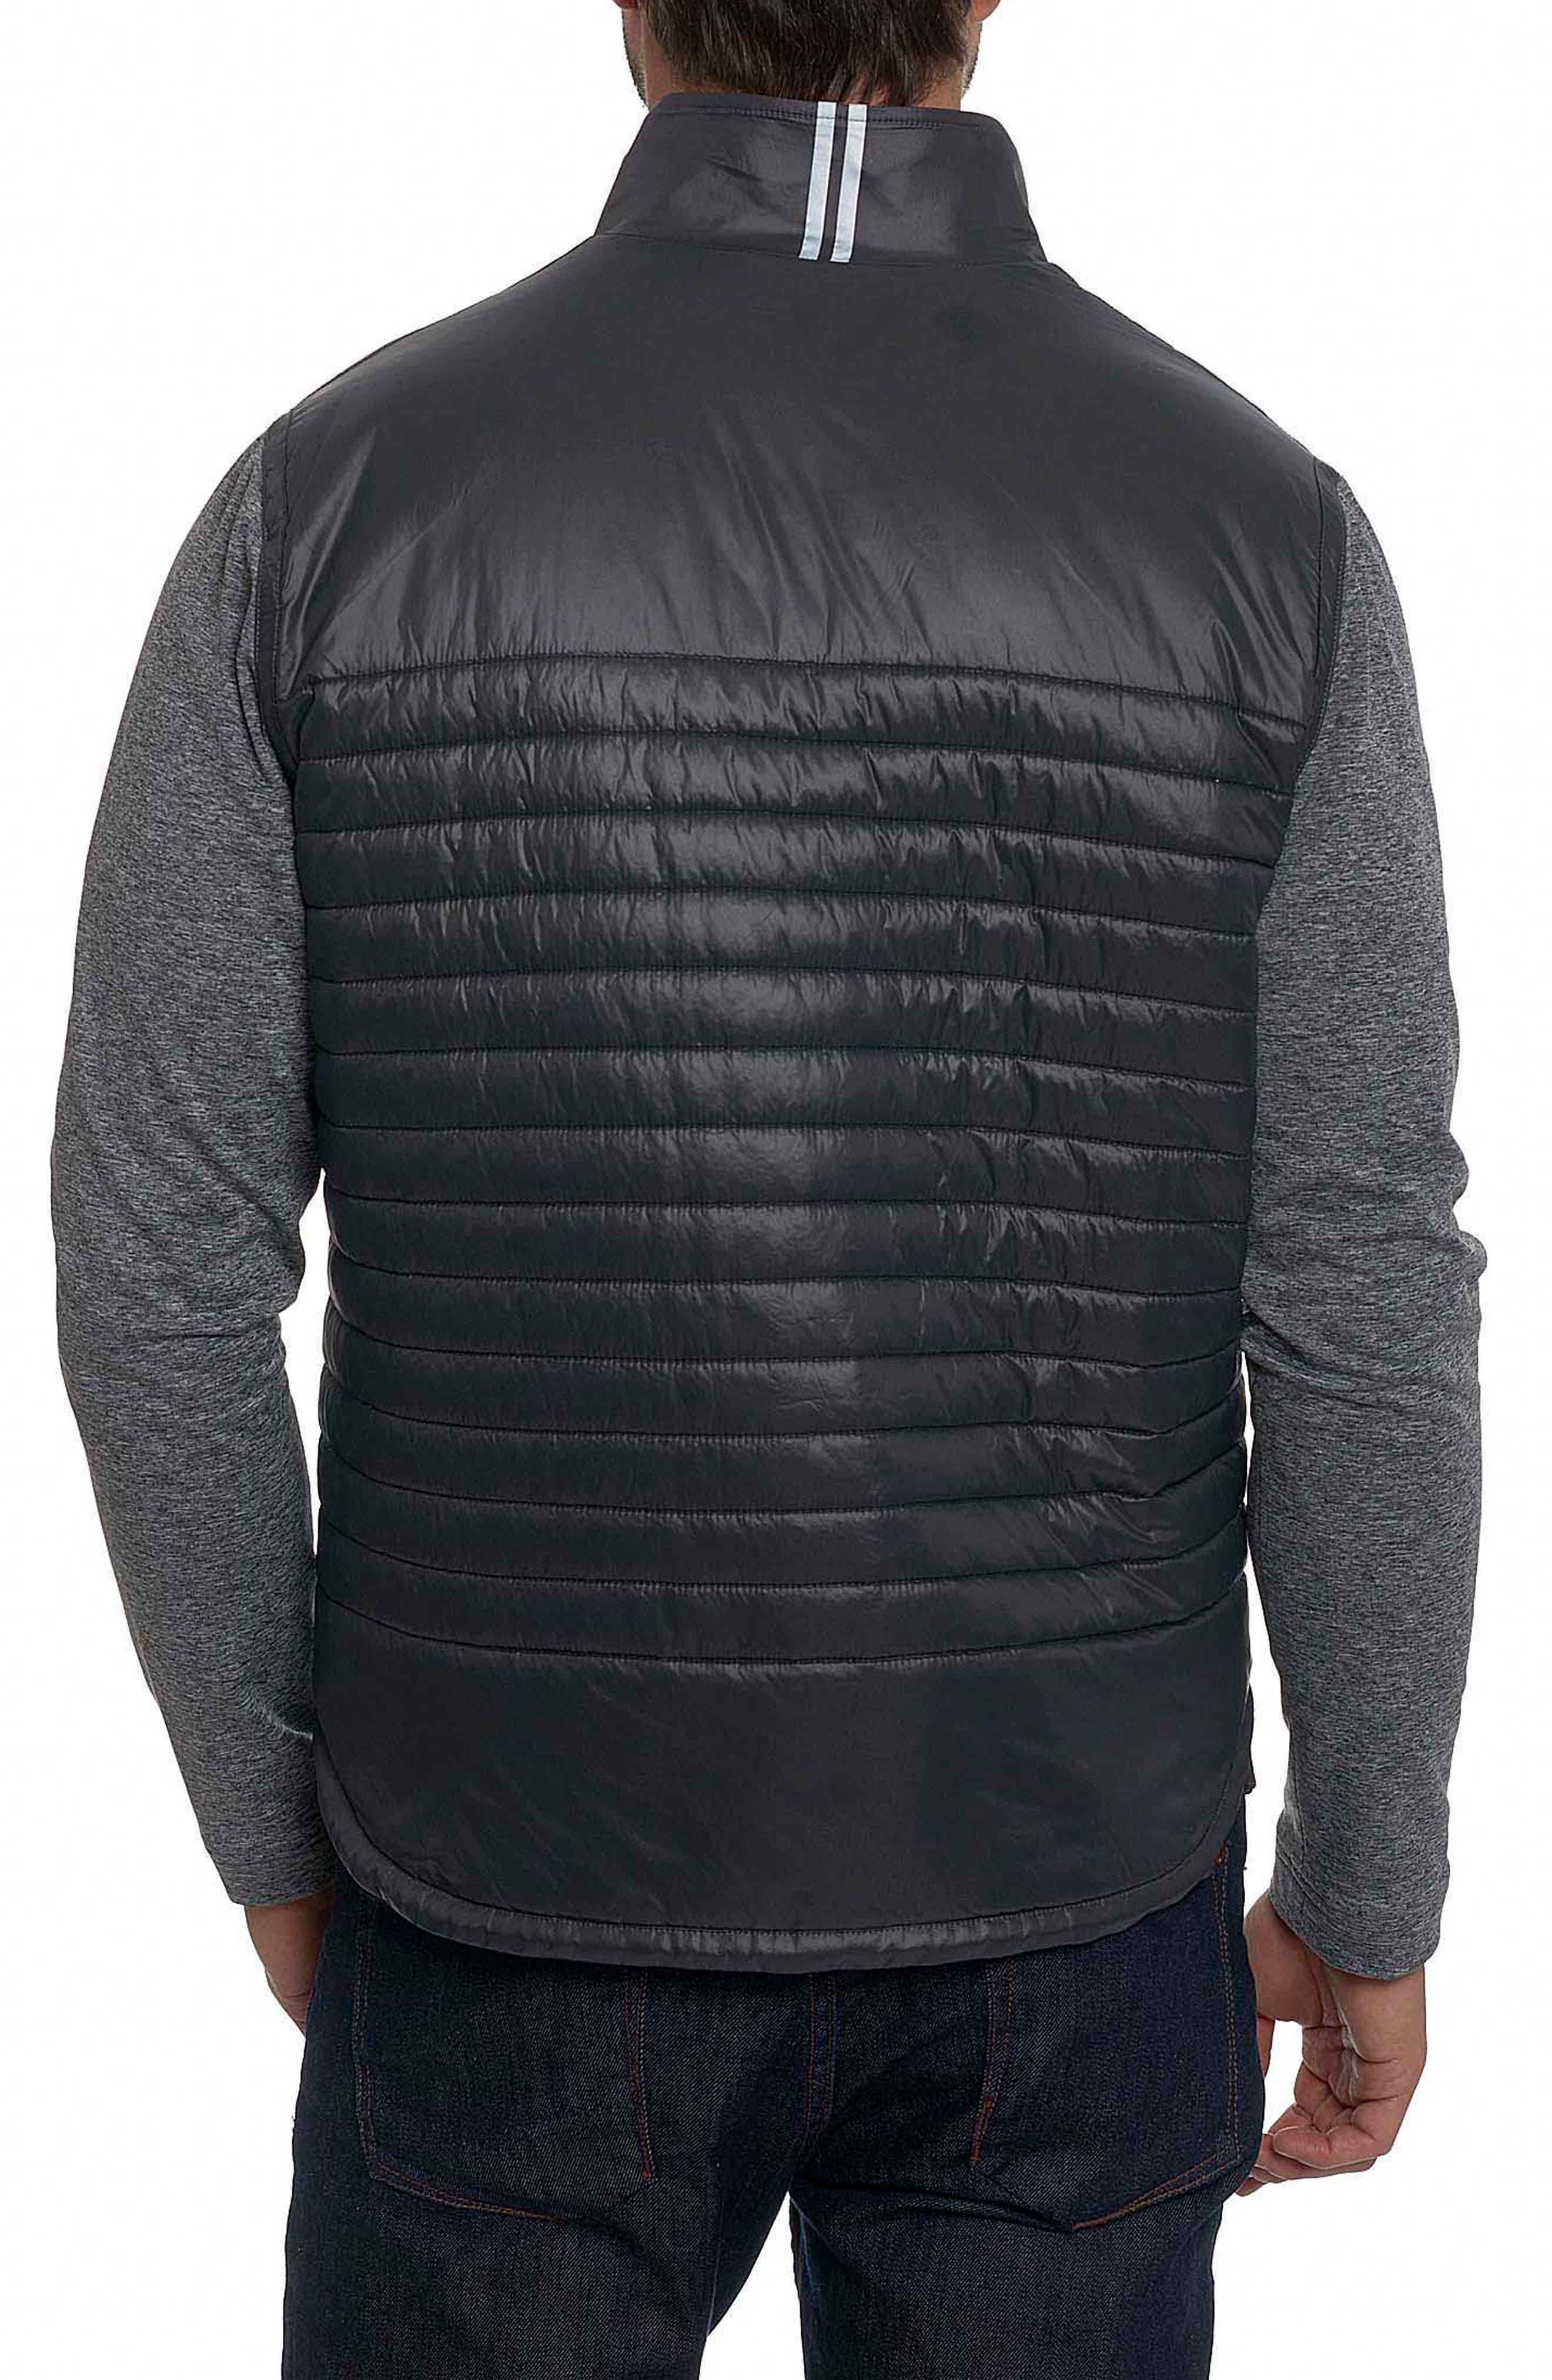 Poconos Tailored Fit Mixed Media Jacket,                             Alternate thumbnail 2, color,                             060